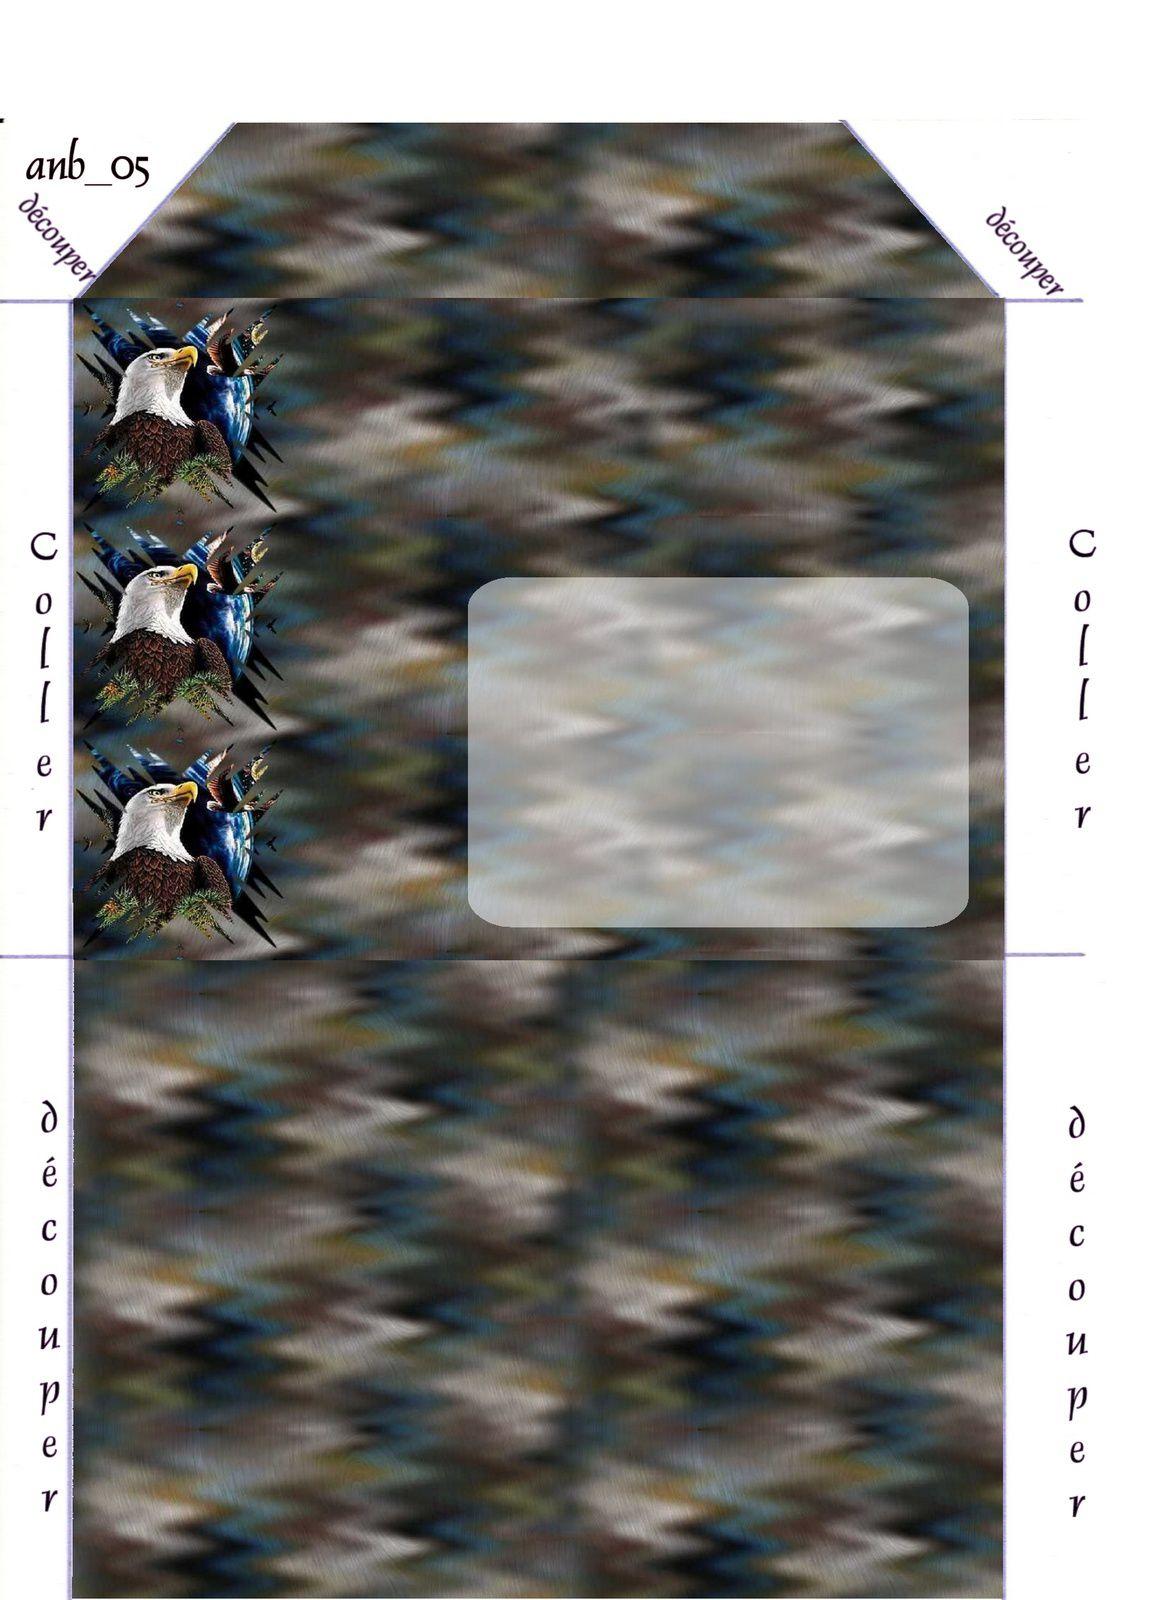 Aigle Incredimail &amp&#x3B; Papier A4 h l &amp&#x3B; outlook &amp&#x3B; enveloppe &amp&#x3B; 2 cartes A5 &amp&#x3B; signets 3 langues   aigle3